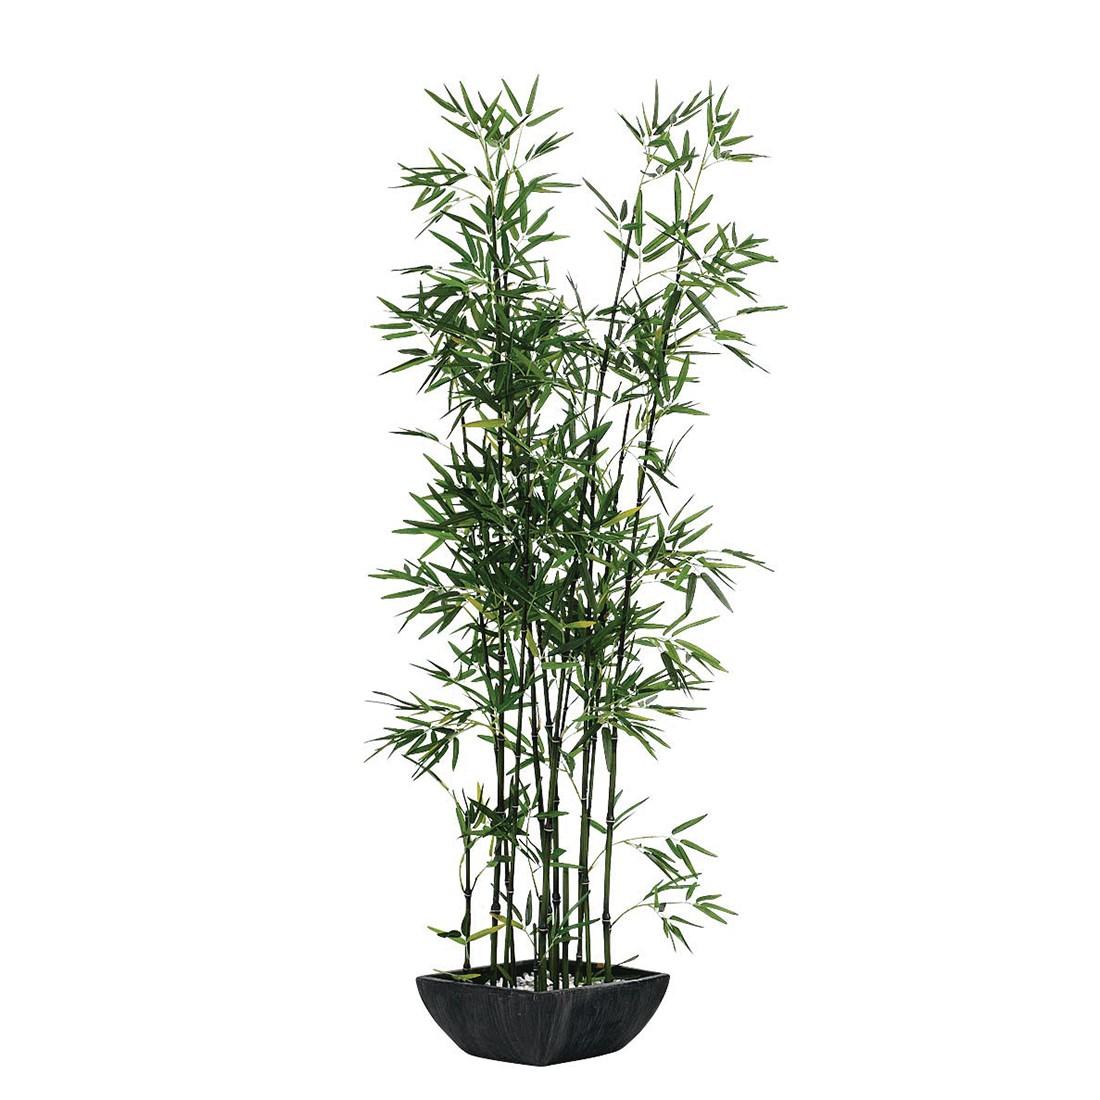 Kunstpflanze Bambus im Terrakottatopf – Textil – Grün, PureDay online kaufen